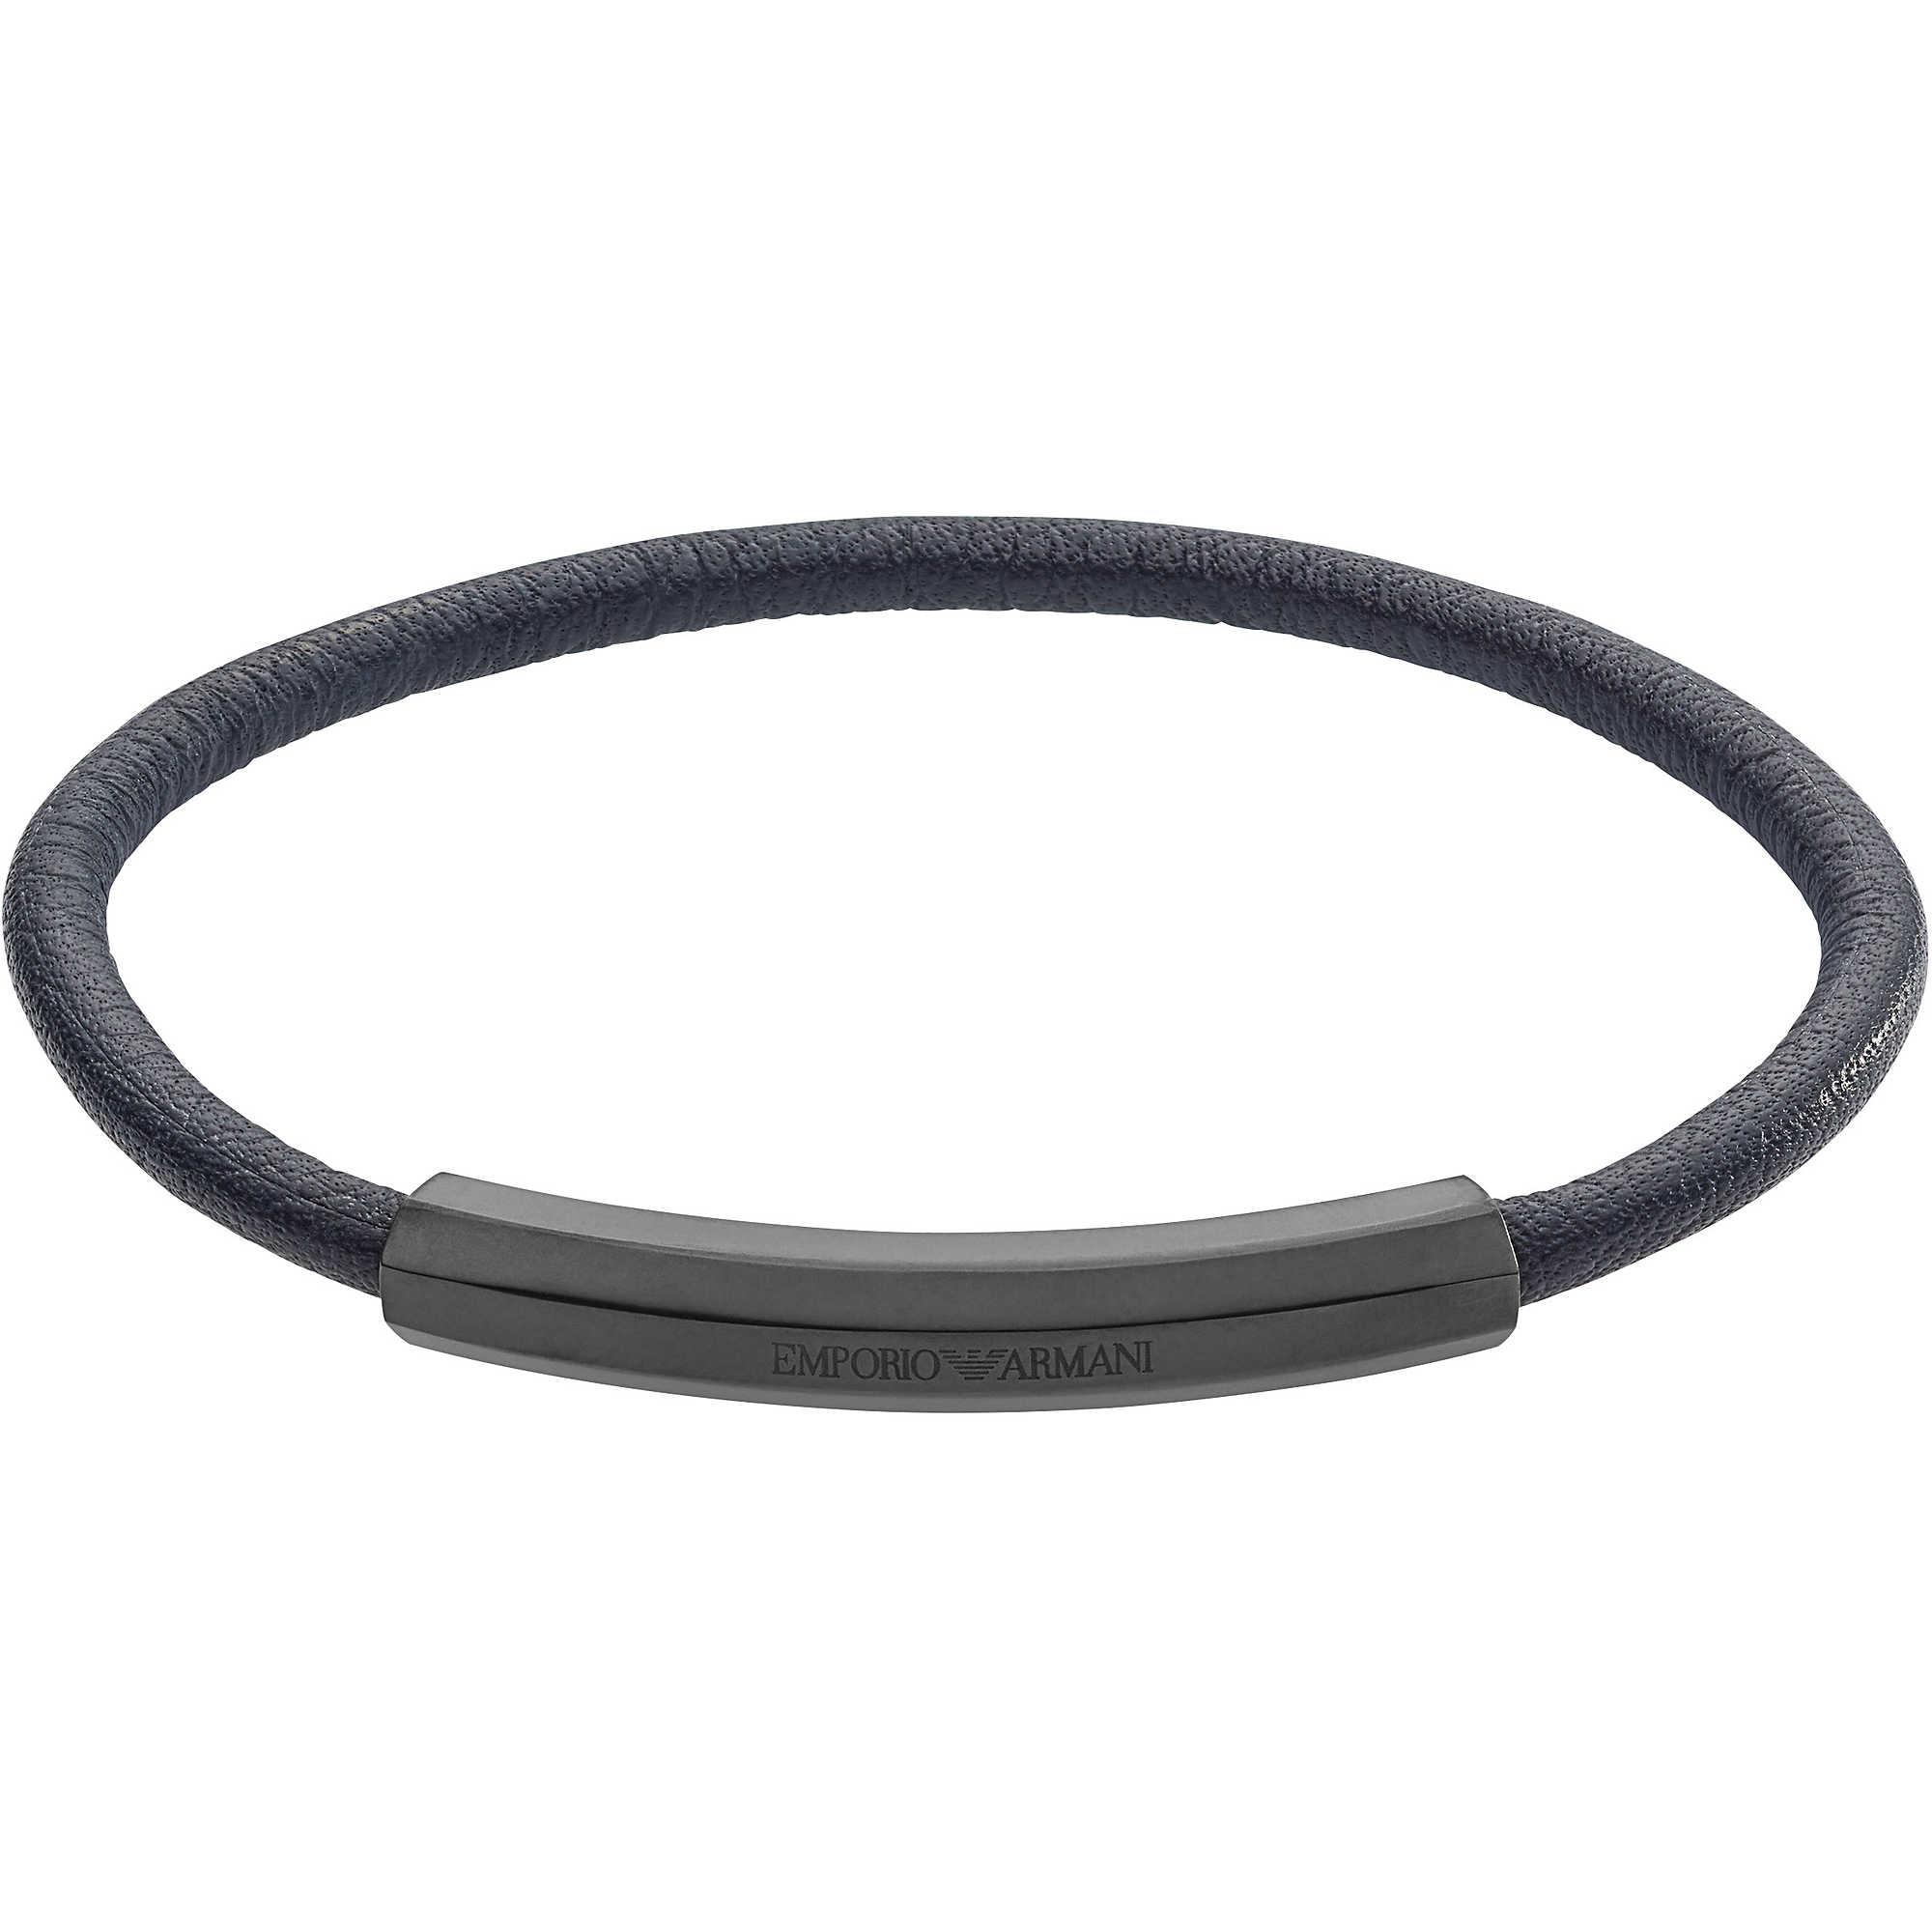 bracelet man jewellery Emporio Armani EGS2403060 bracelets Emporio ... da23779b668